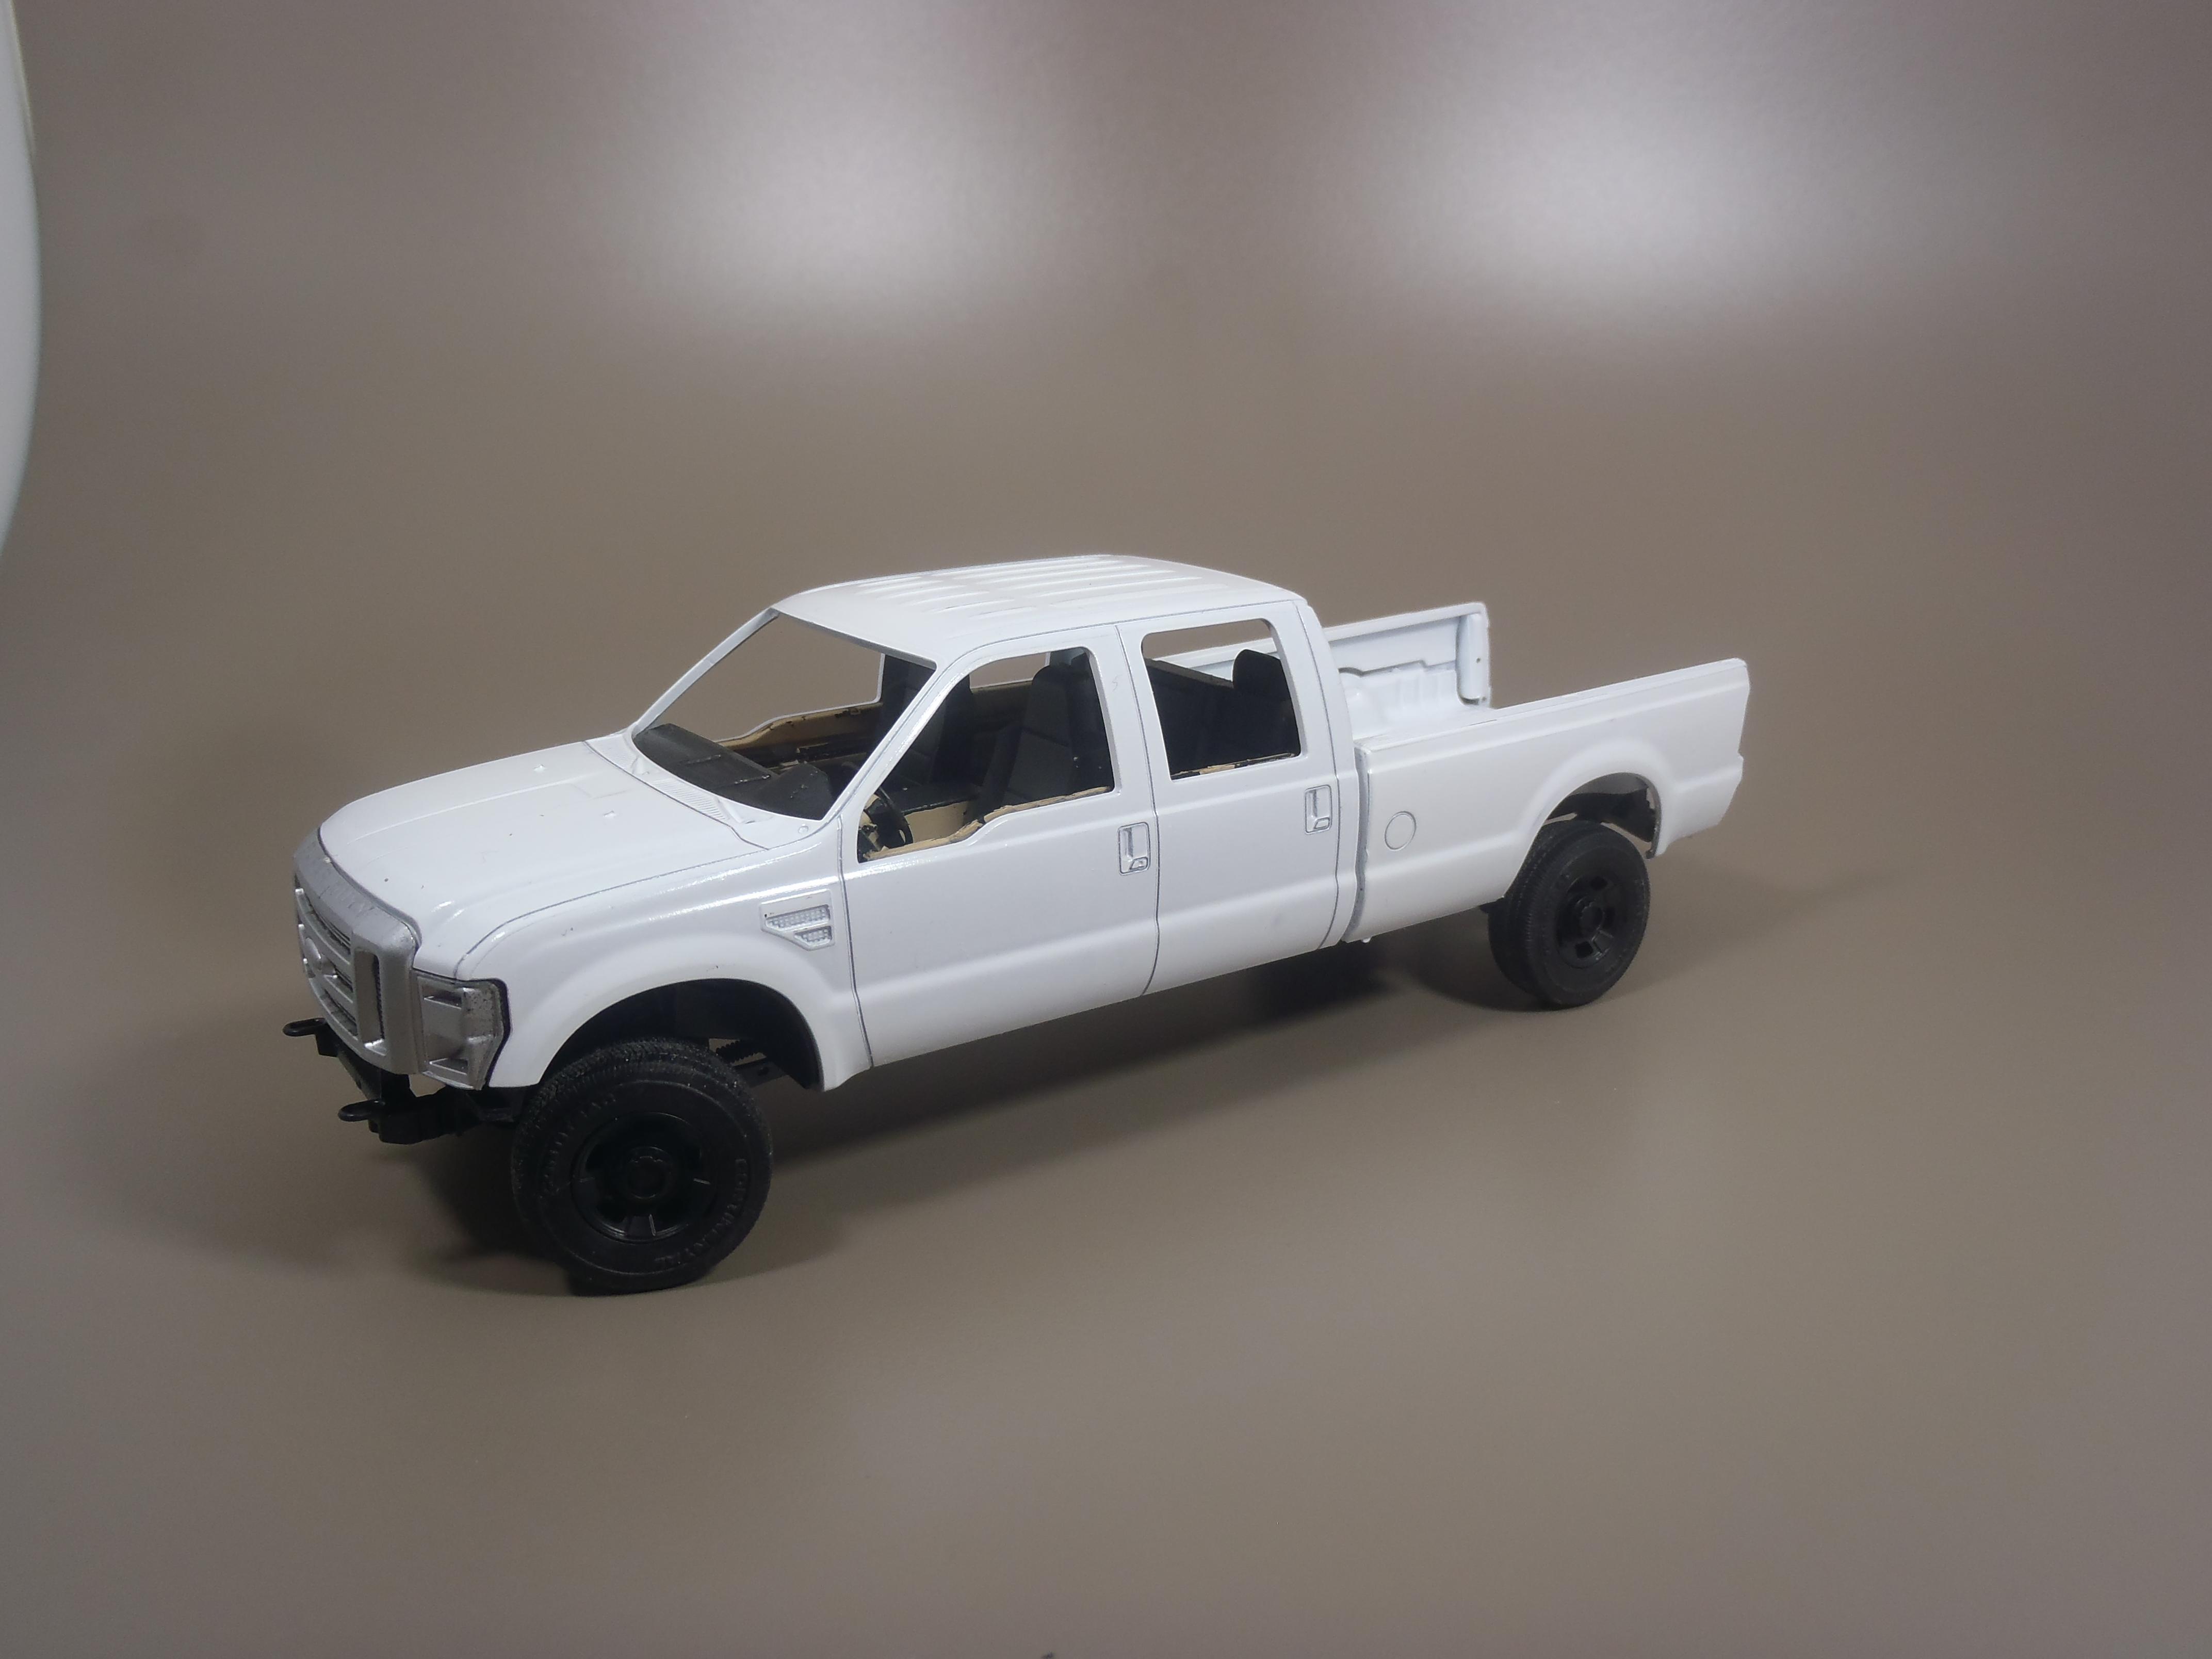 Pickup F 350 (Meng) au 1/35 - Page 2 16111509533715742614639658